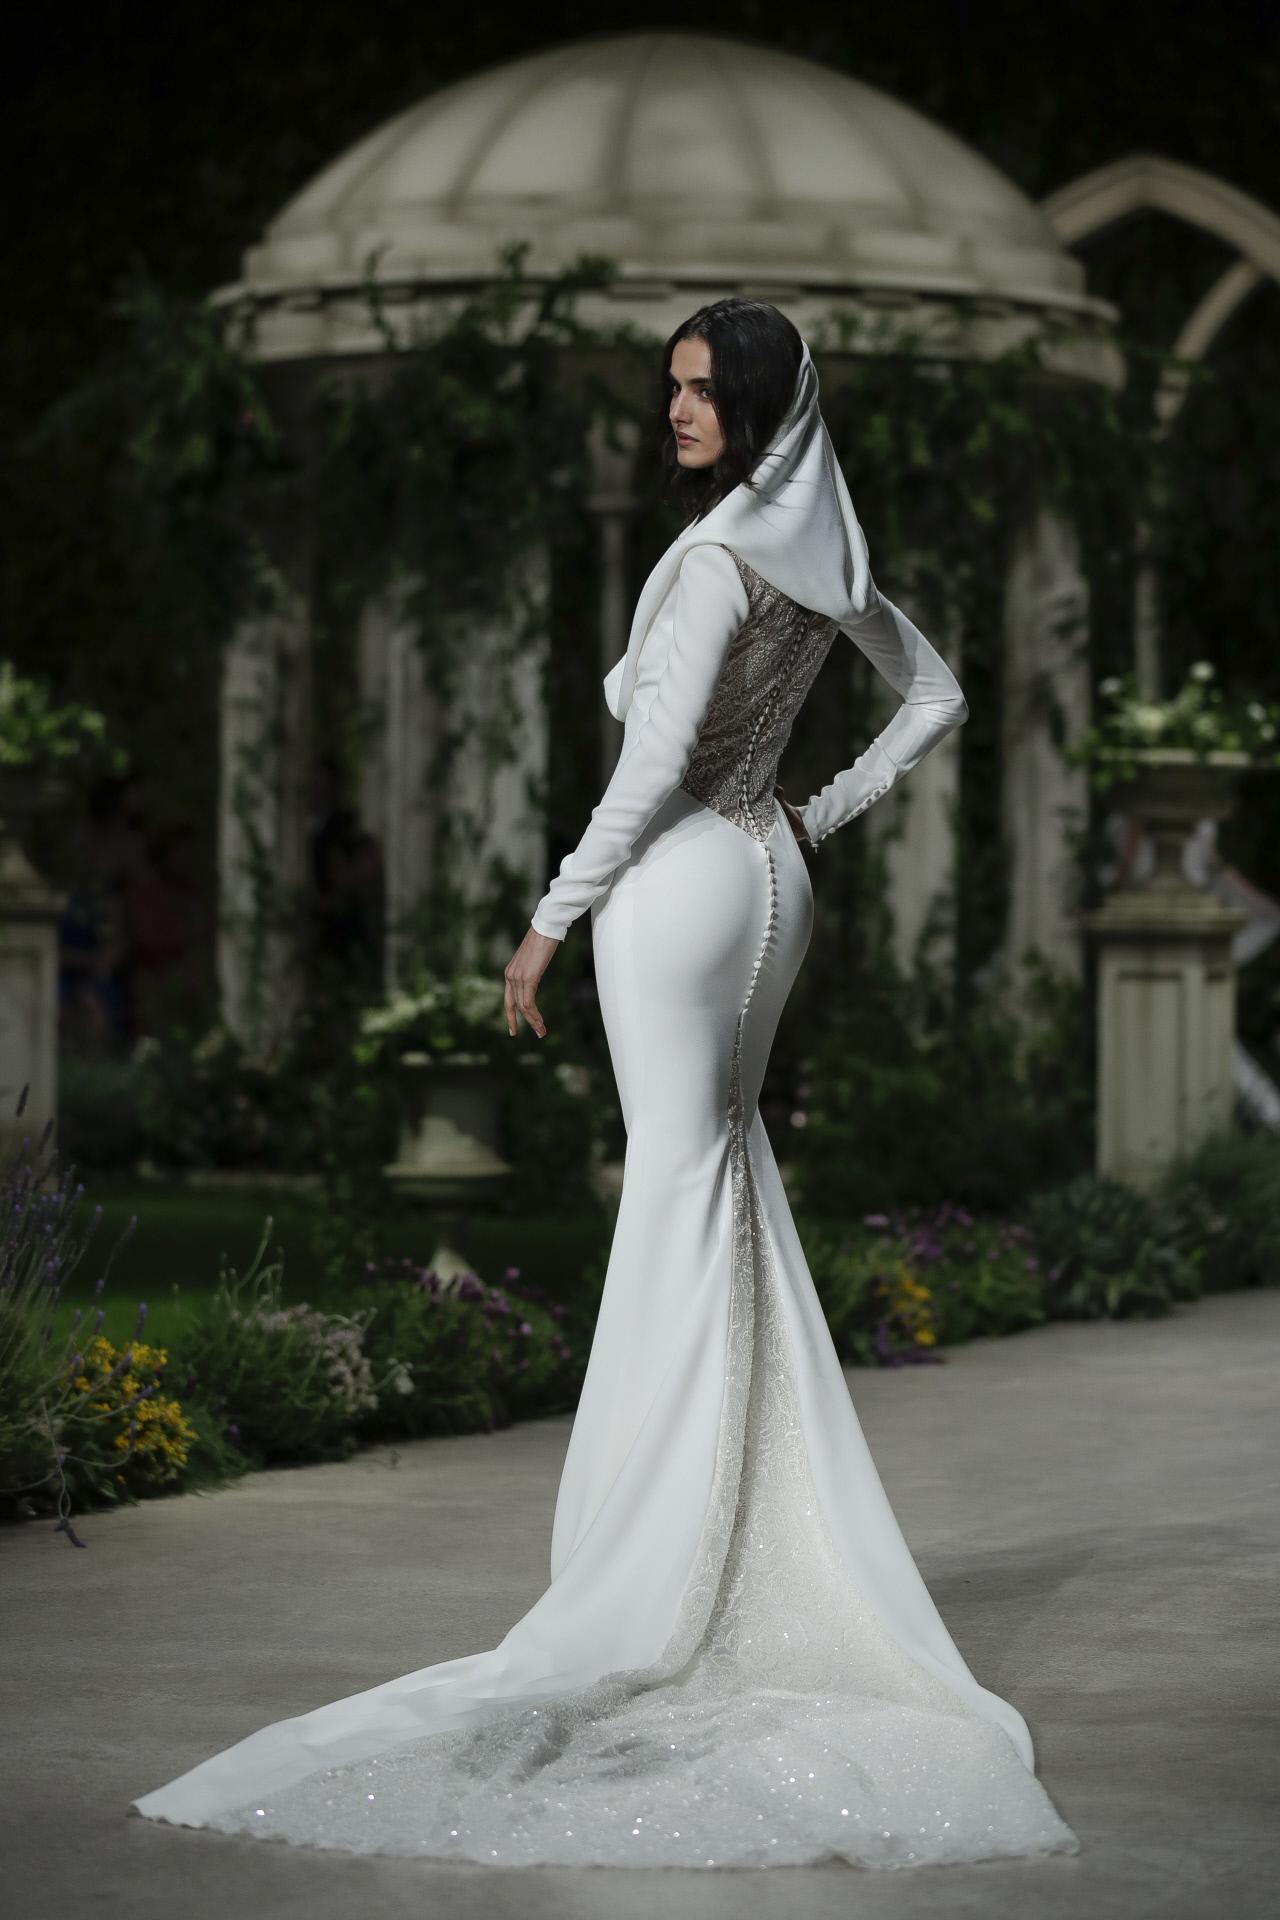 La modelo Blanca Padilla en el desfile de Pronovias 2019